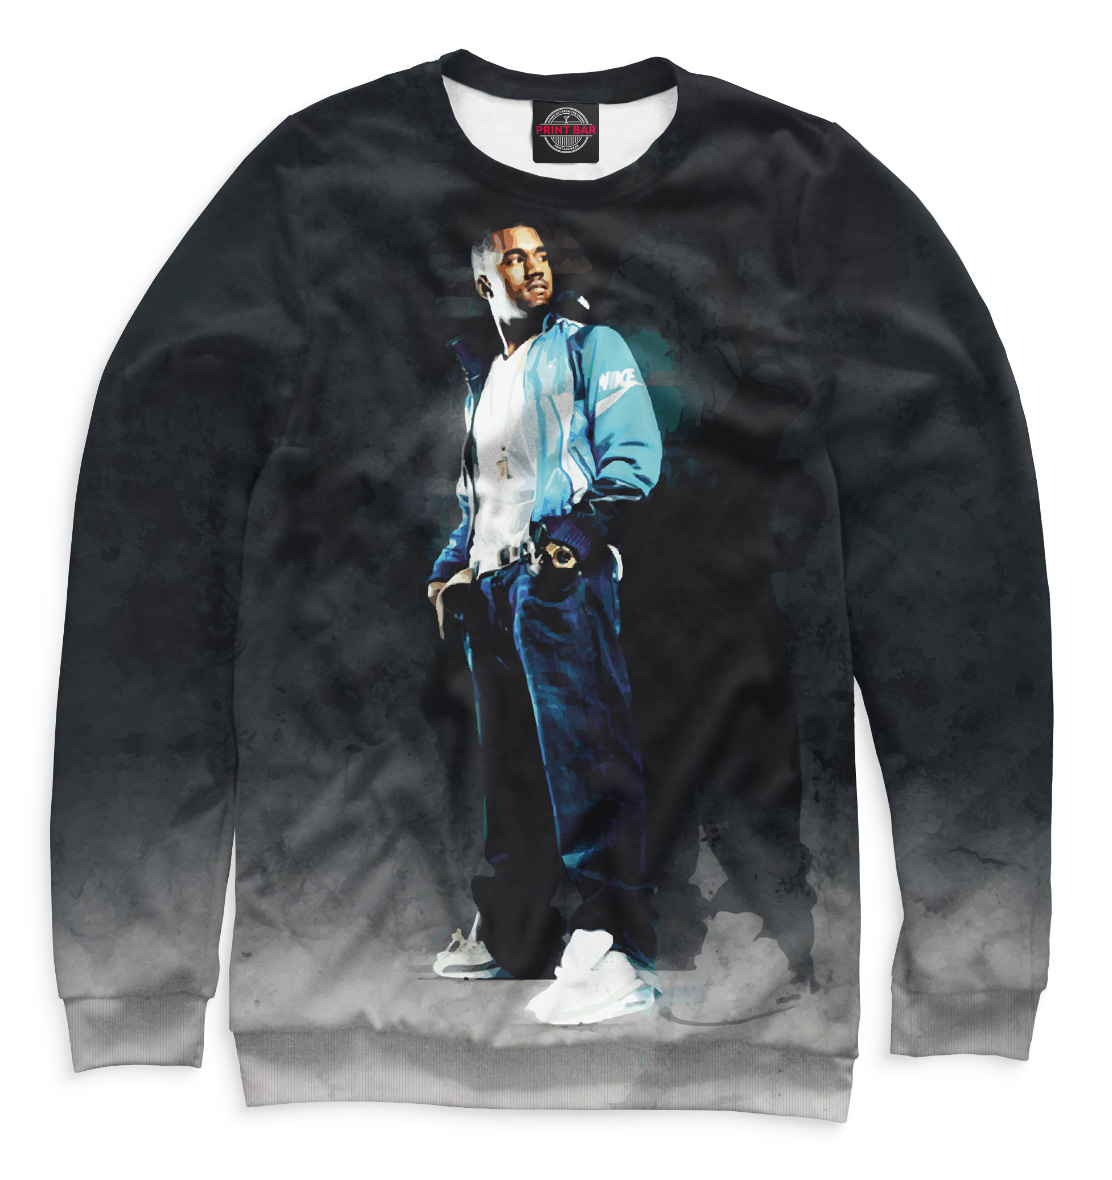 Купить Kanye West, Printbar, Свитшоты, KAW-290718-swi-1